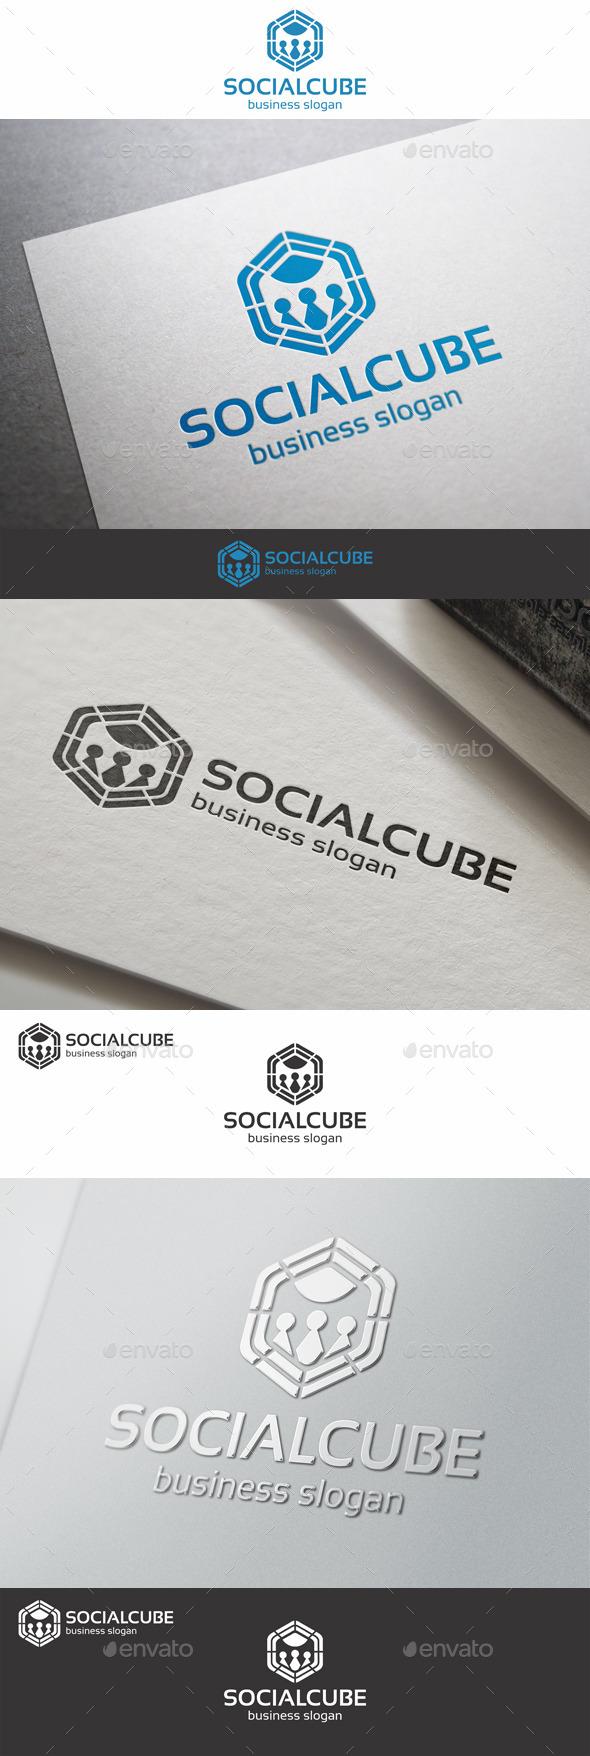 Social Cube Network Logo